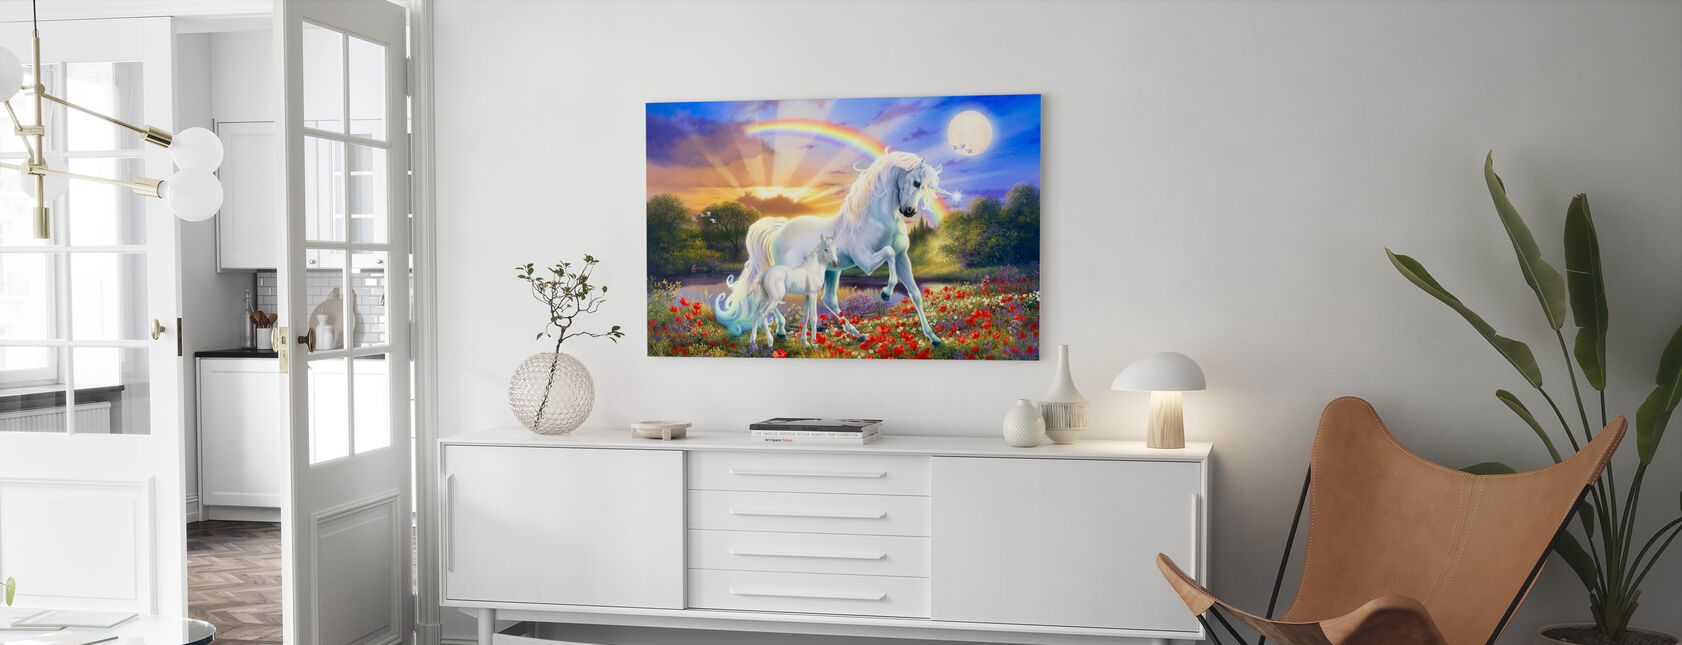 Rainbow Unicorn - Canvas print - Living Room